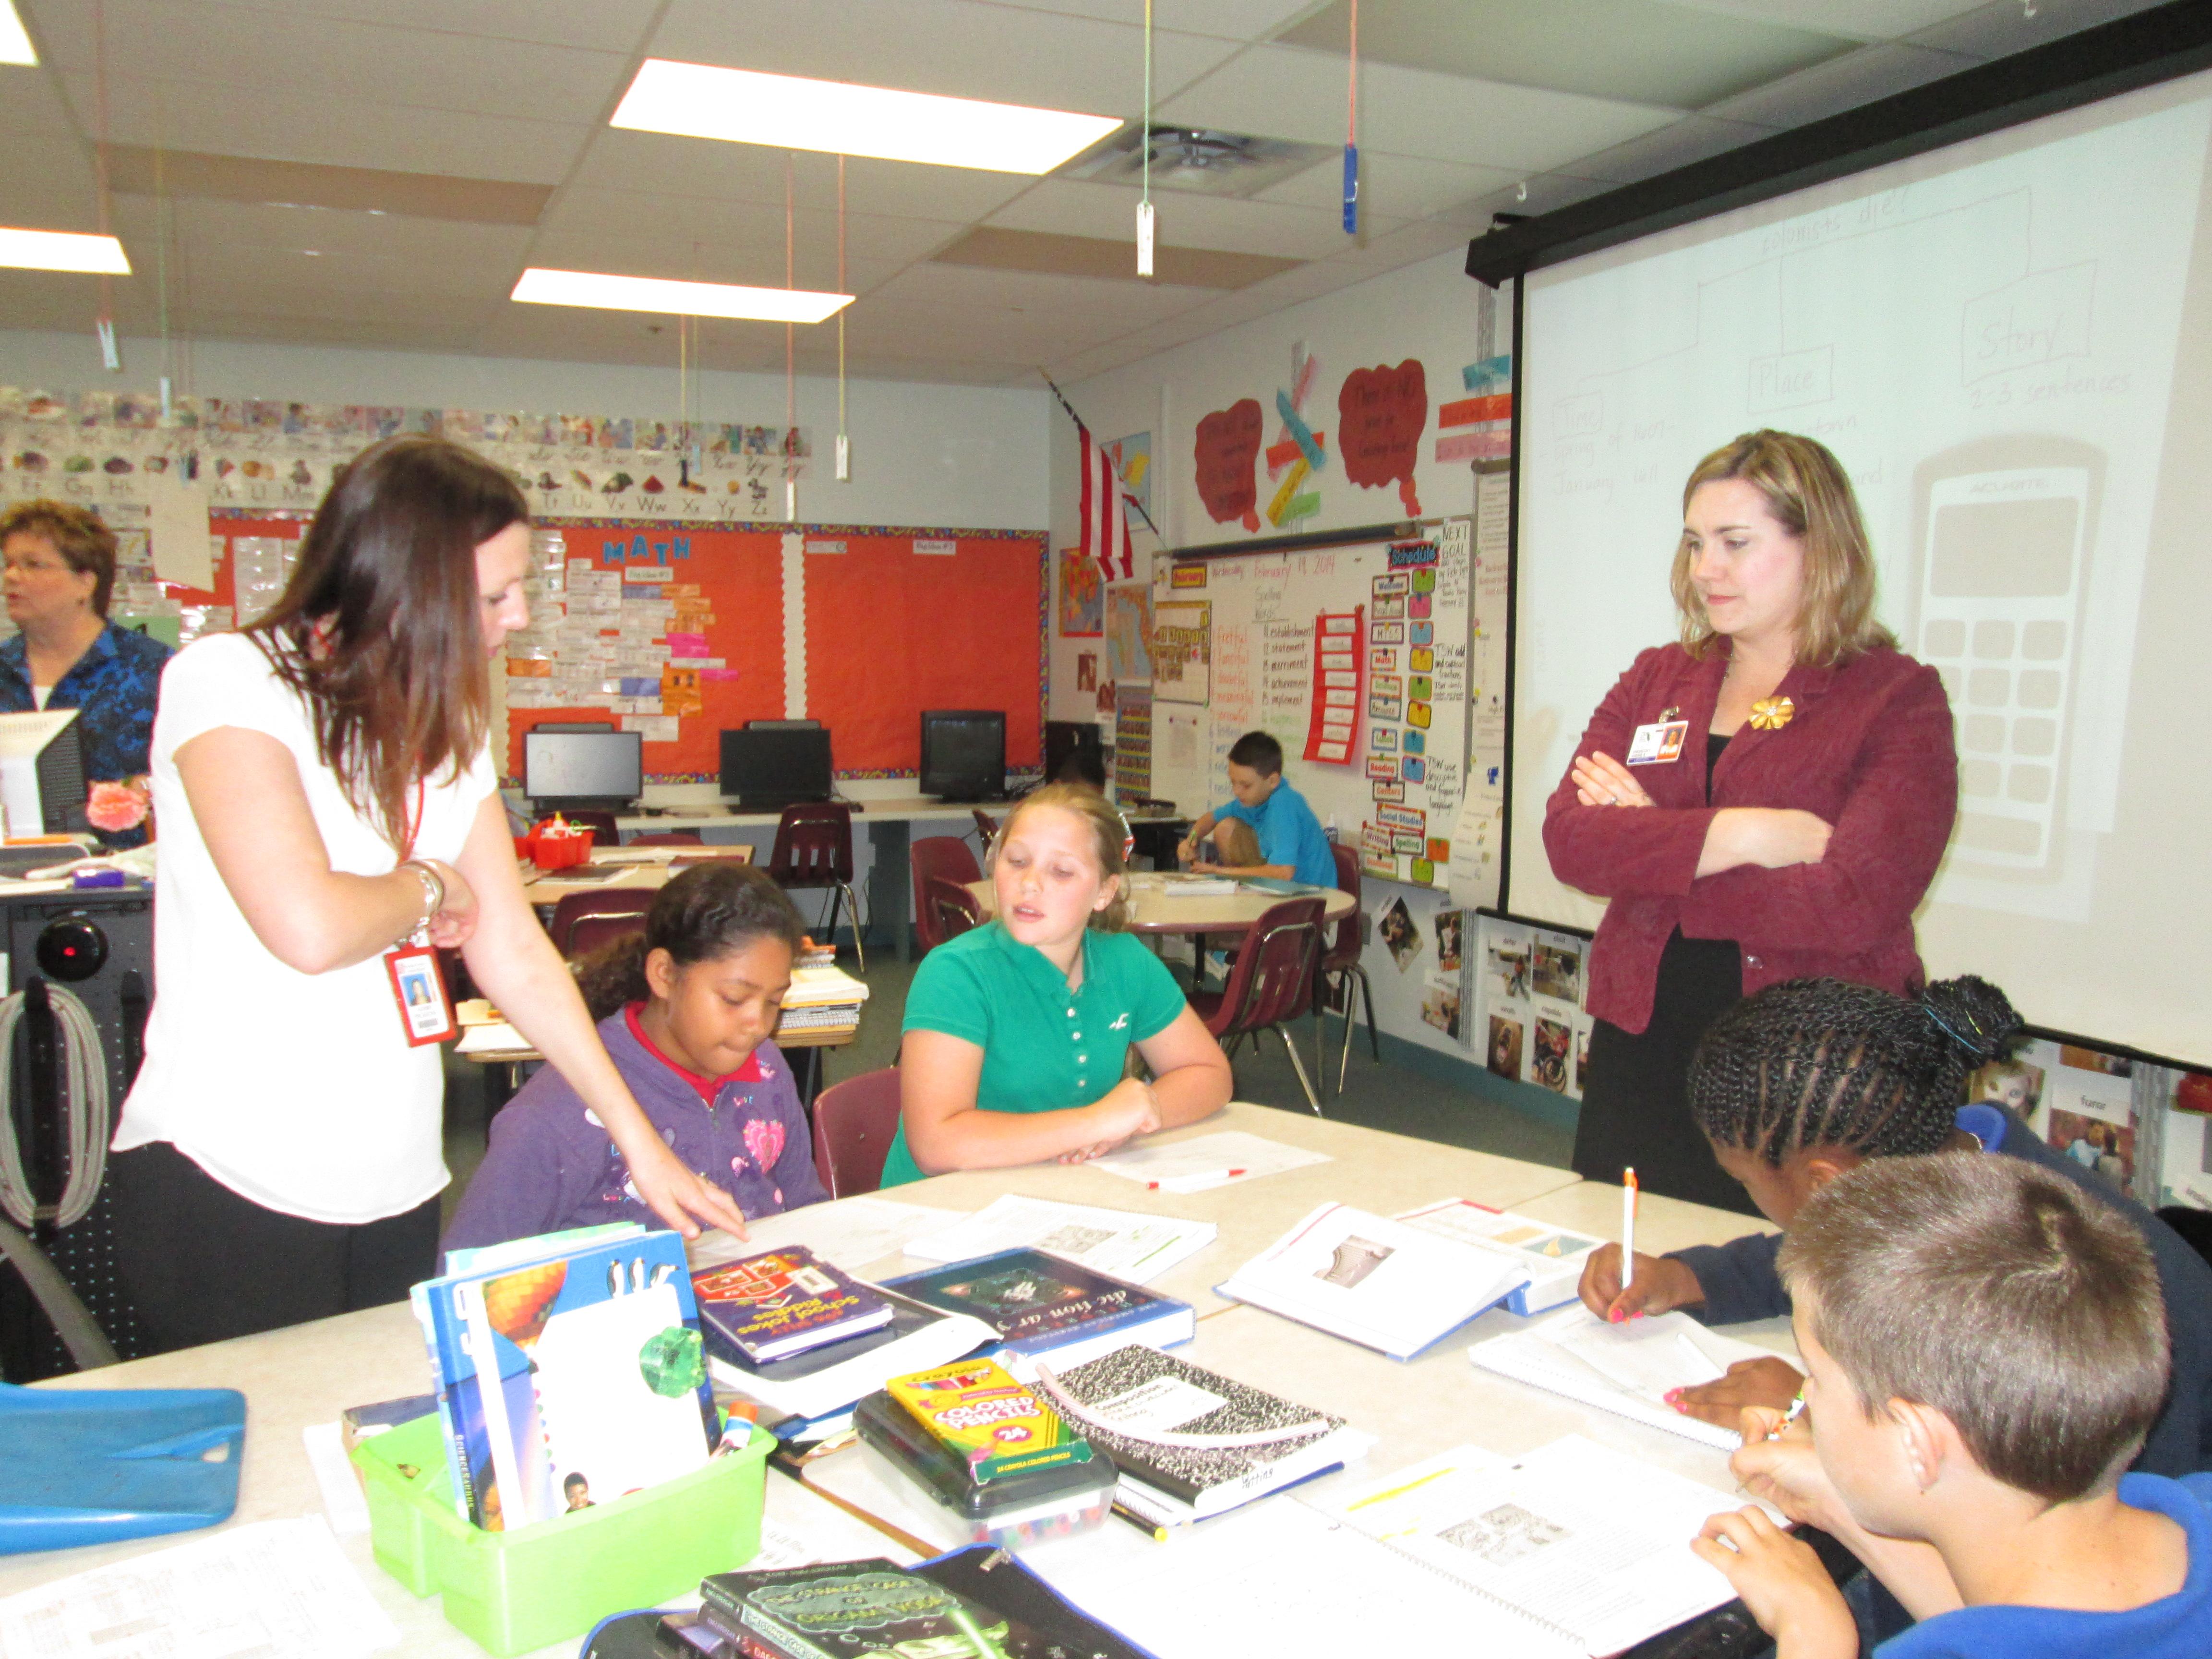 Savanna Ridge students impress visitors with high level thinking DBQ activities